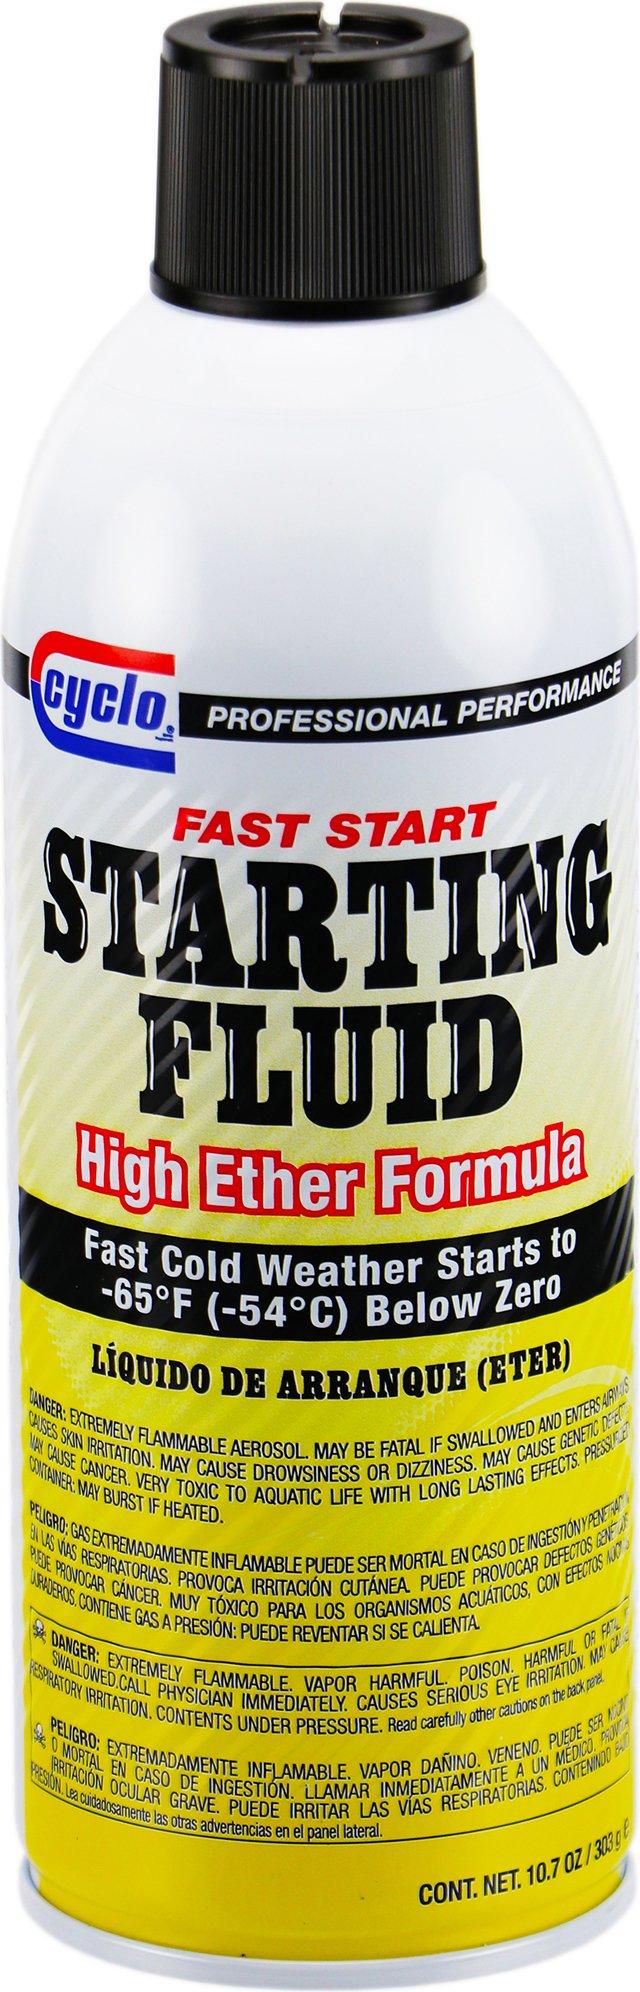 Niteo Cyclo Fast Start Starting Fluid, High Ether Formula, 10.7 fl oz, Case of 12 by Niteo